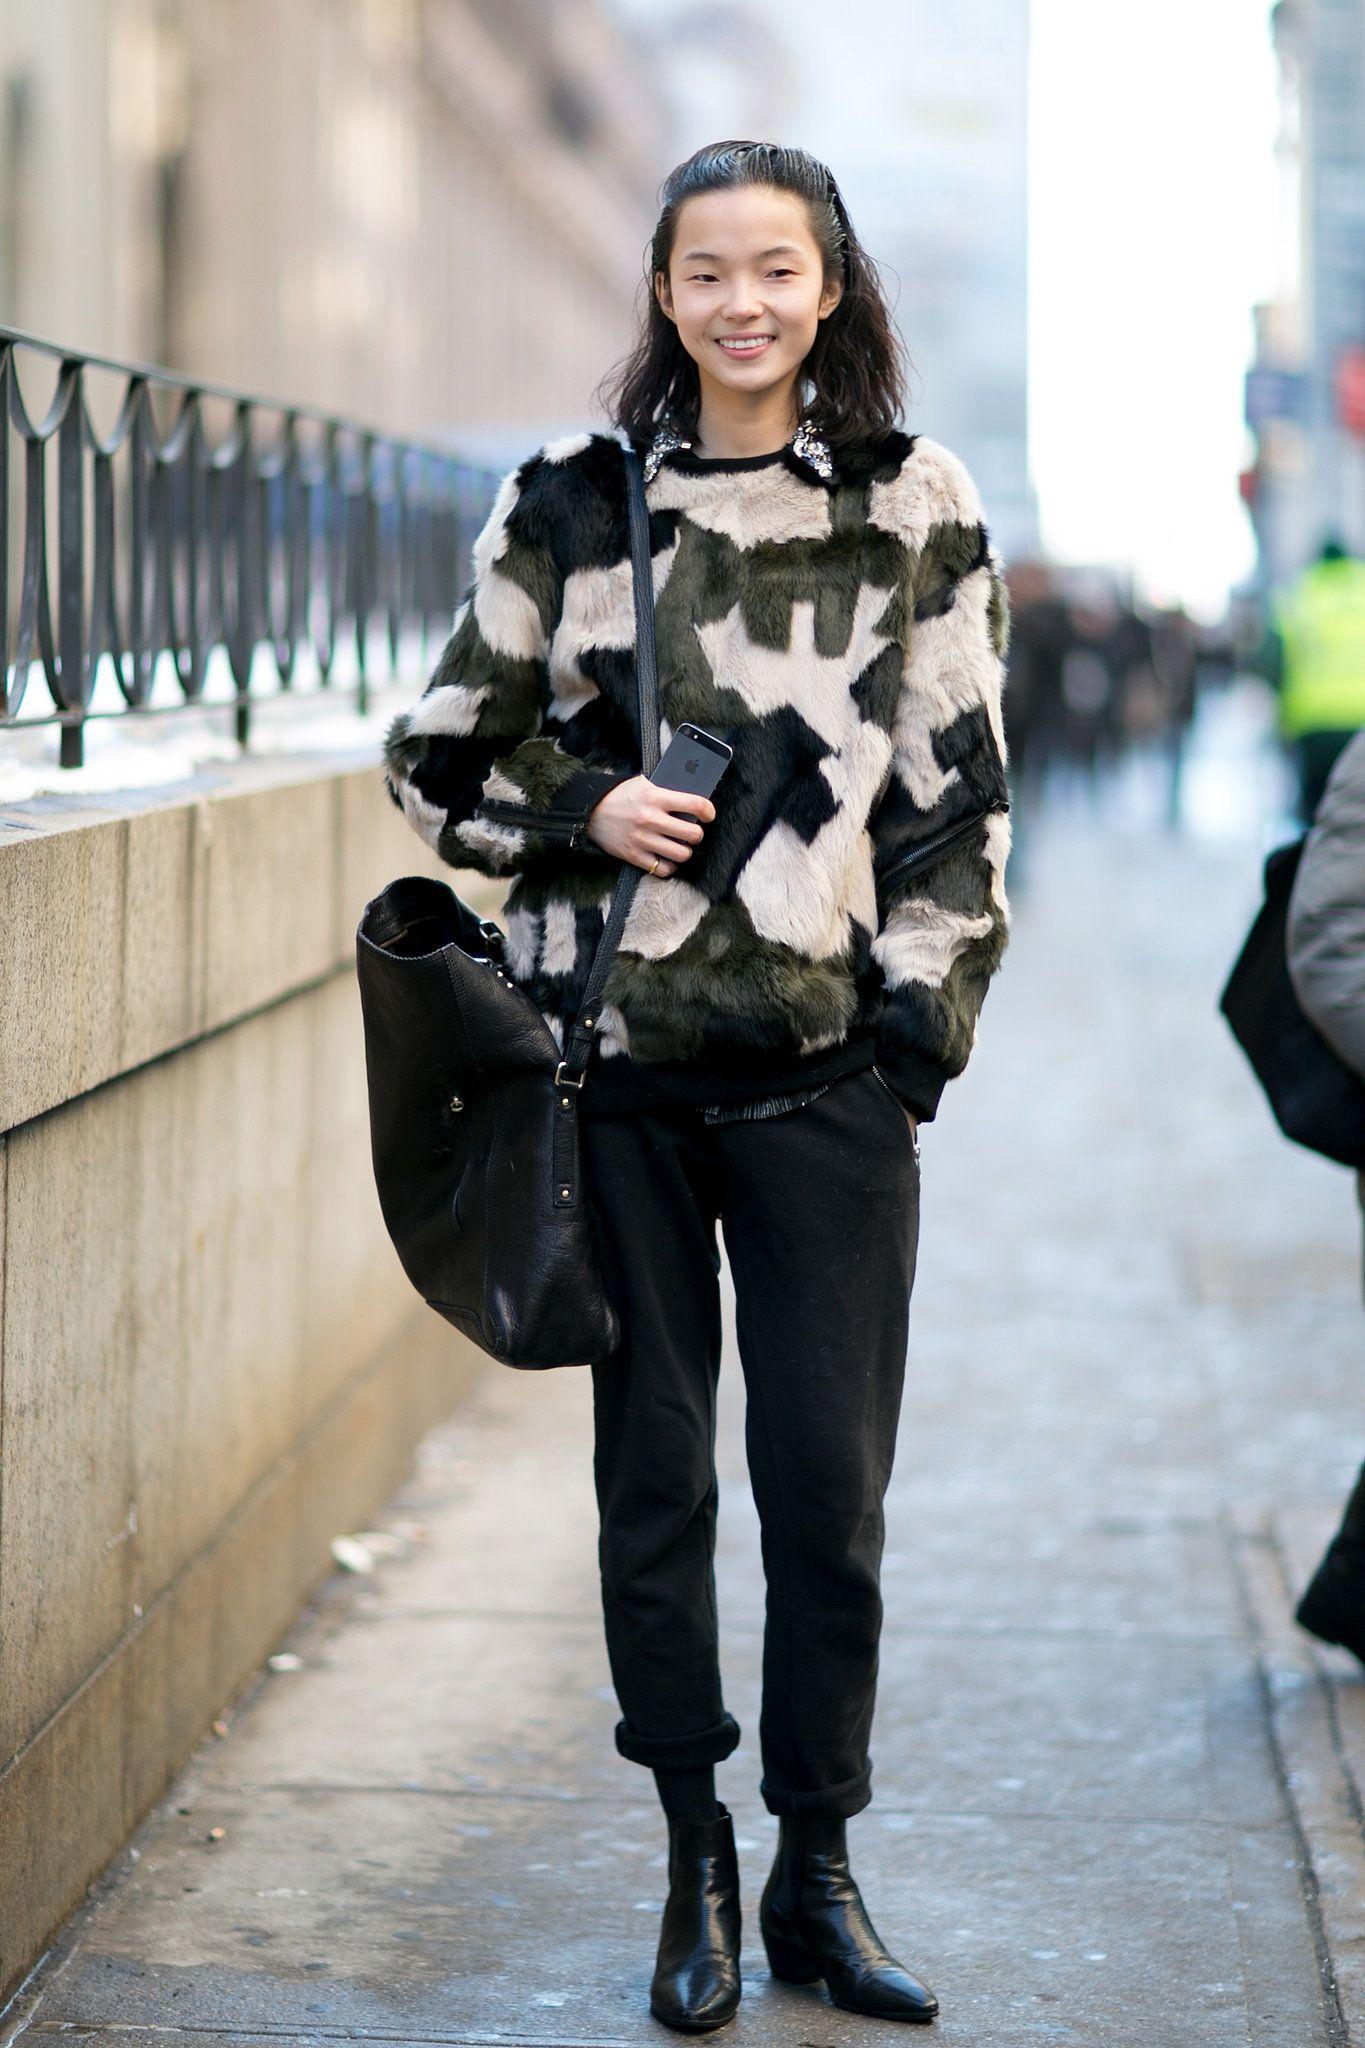 Model street style at New York Fashion Week #nyfw